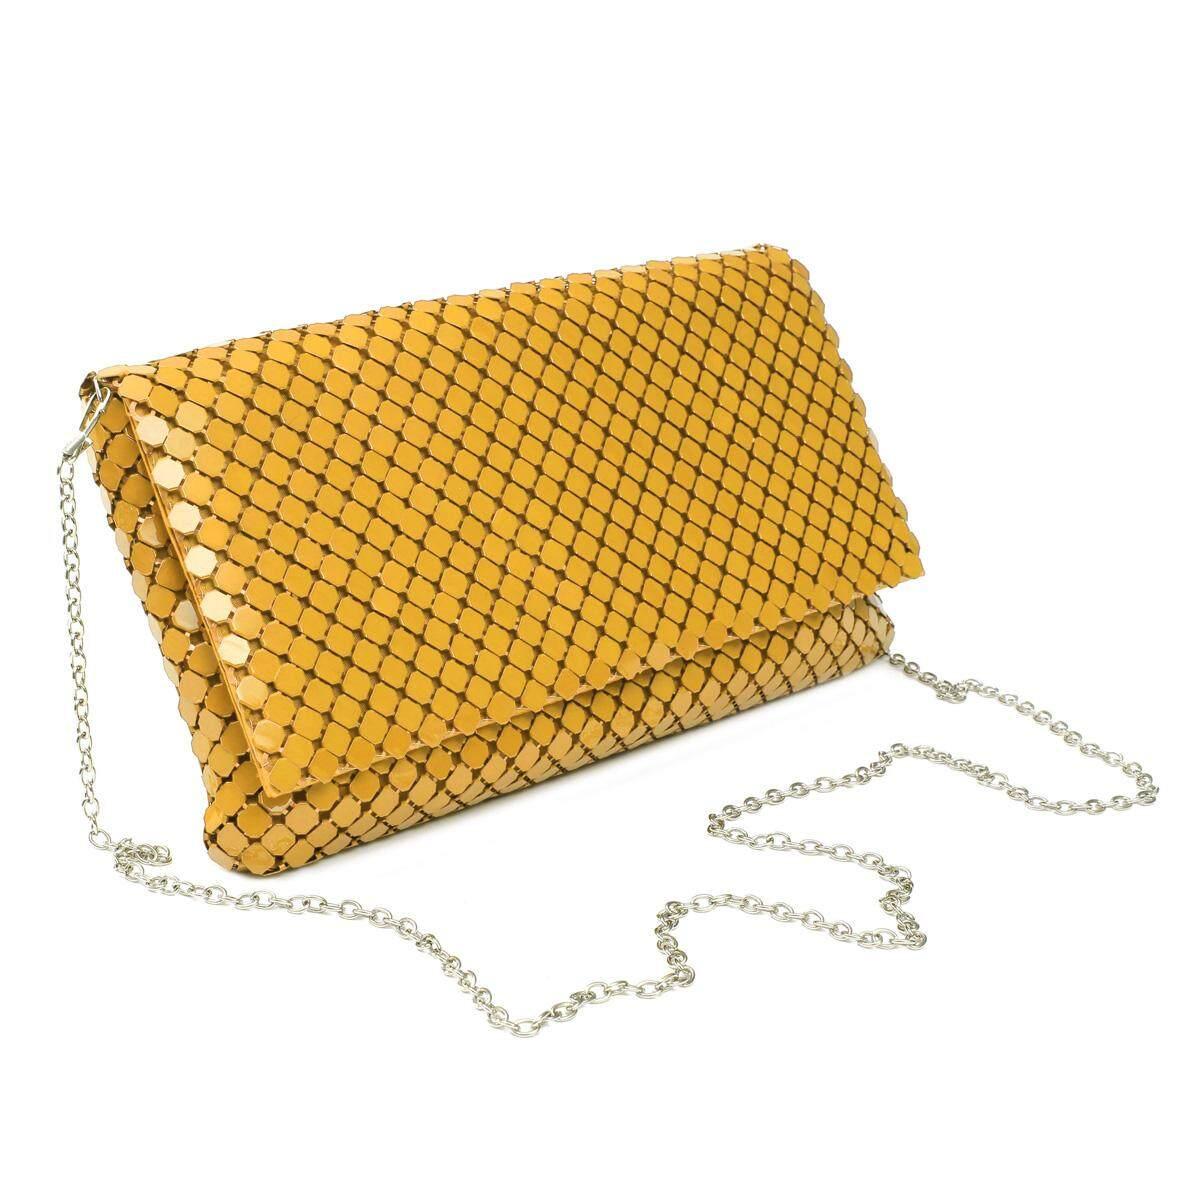 Osmond Fashion Sequined Women s Clutch Bag Shining Women Envelope Evening Bag  Female Clutches Handbag Shoulder Messenger db05311280